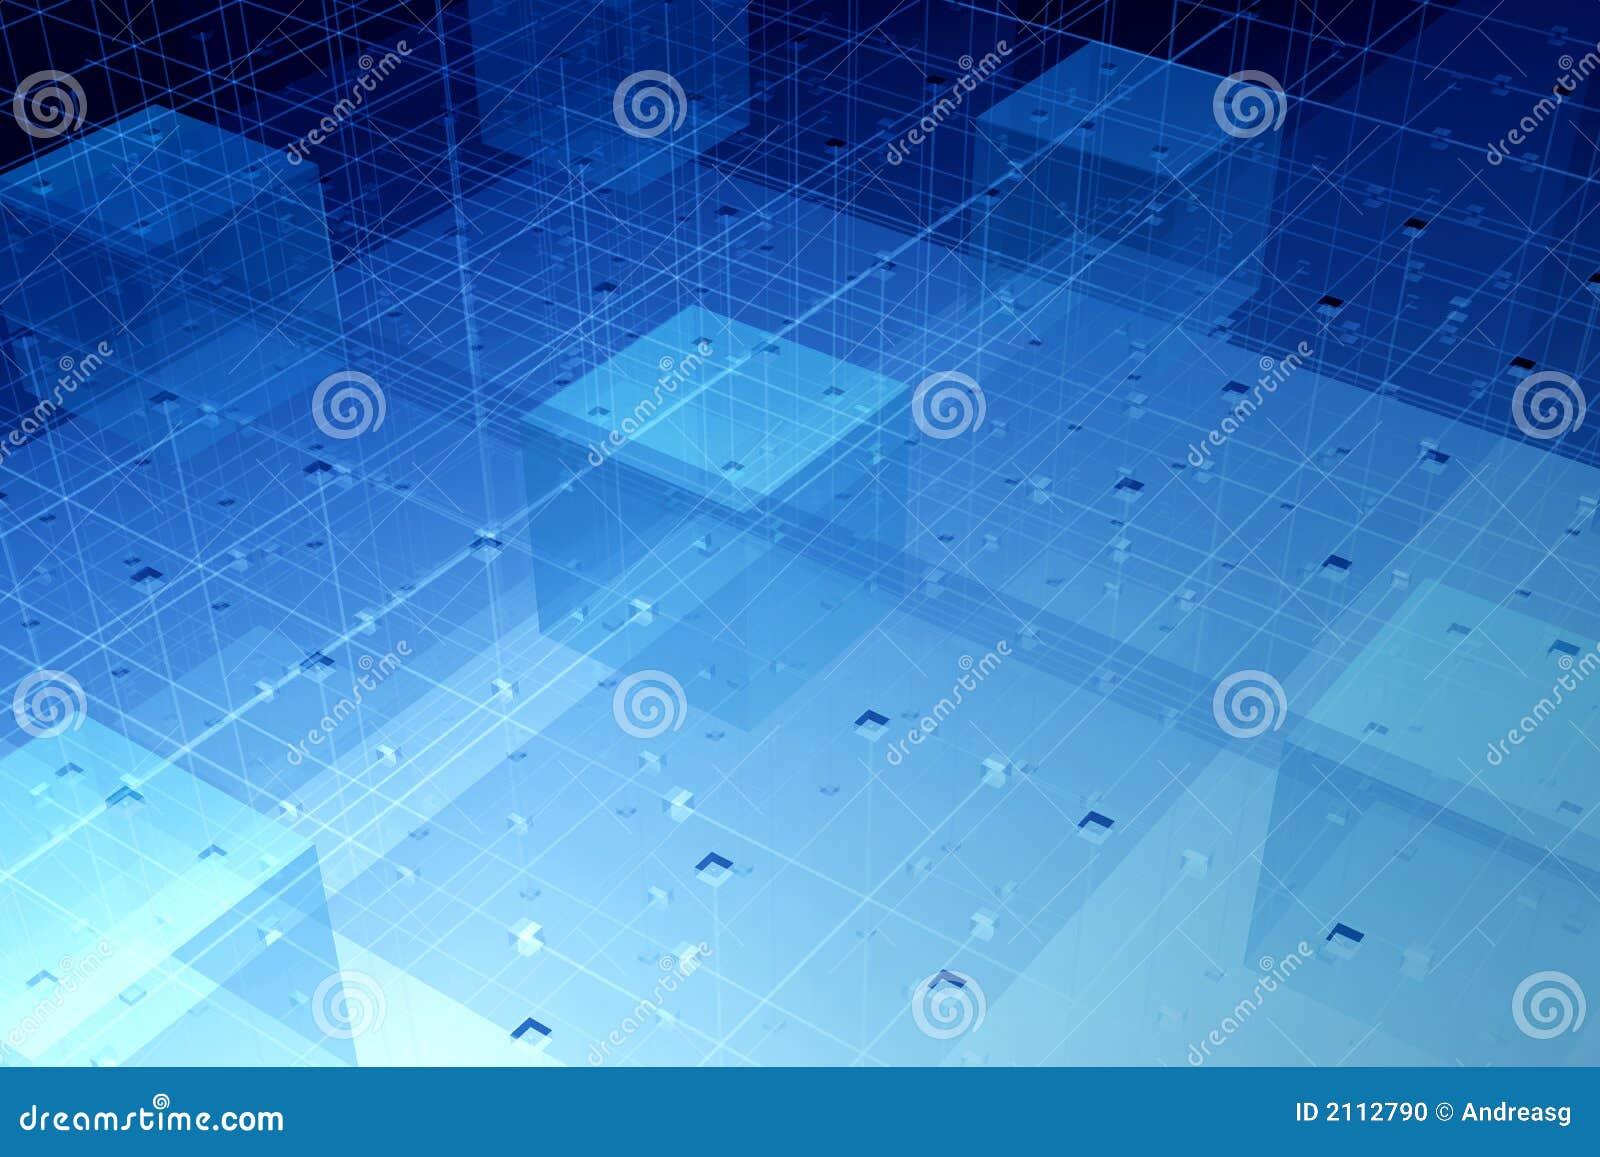 Transparent fiber technology